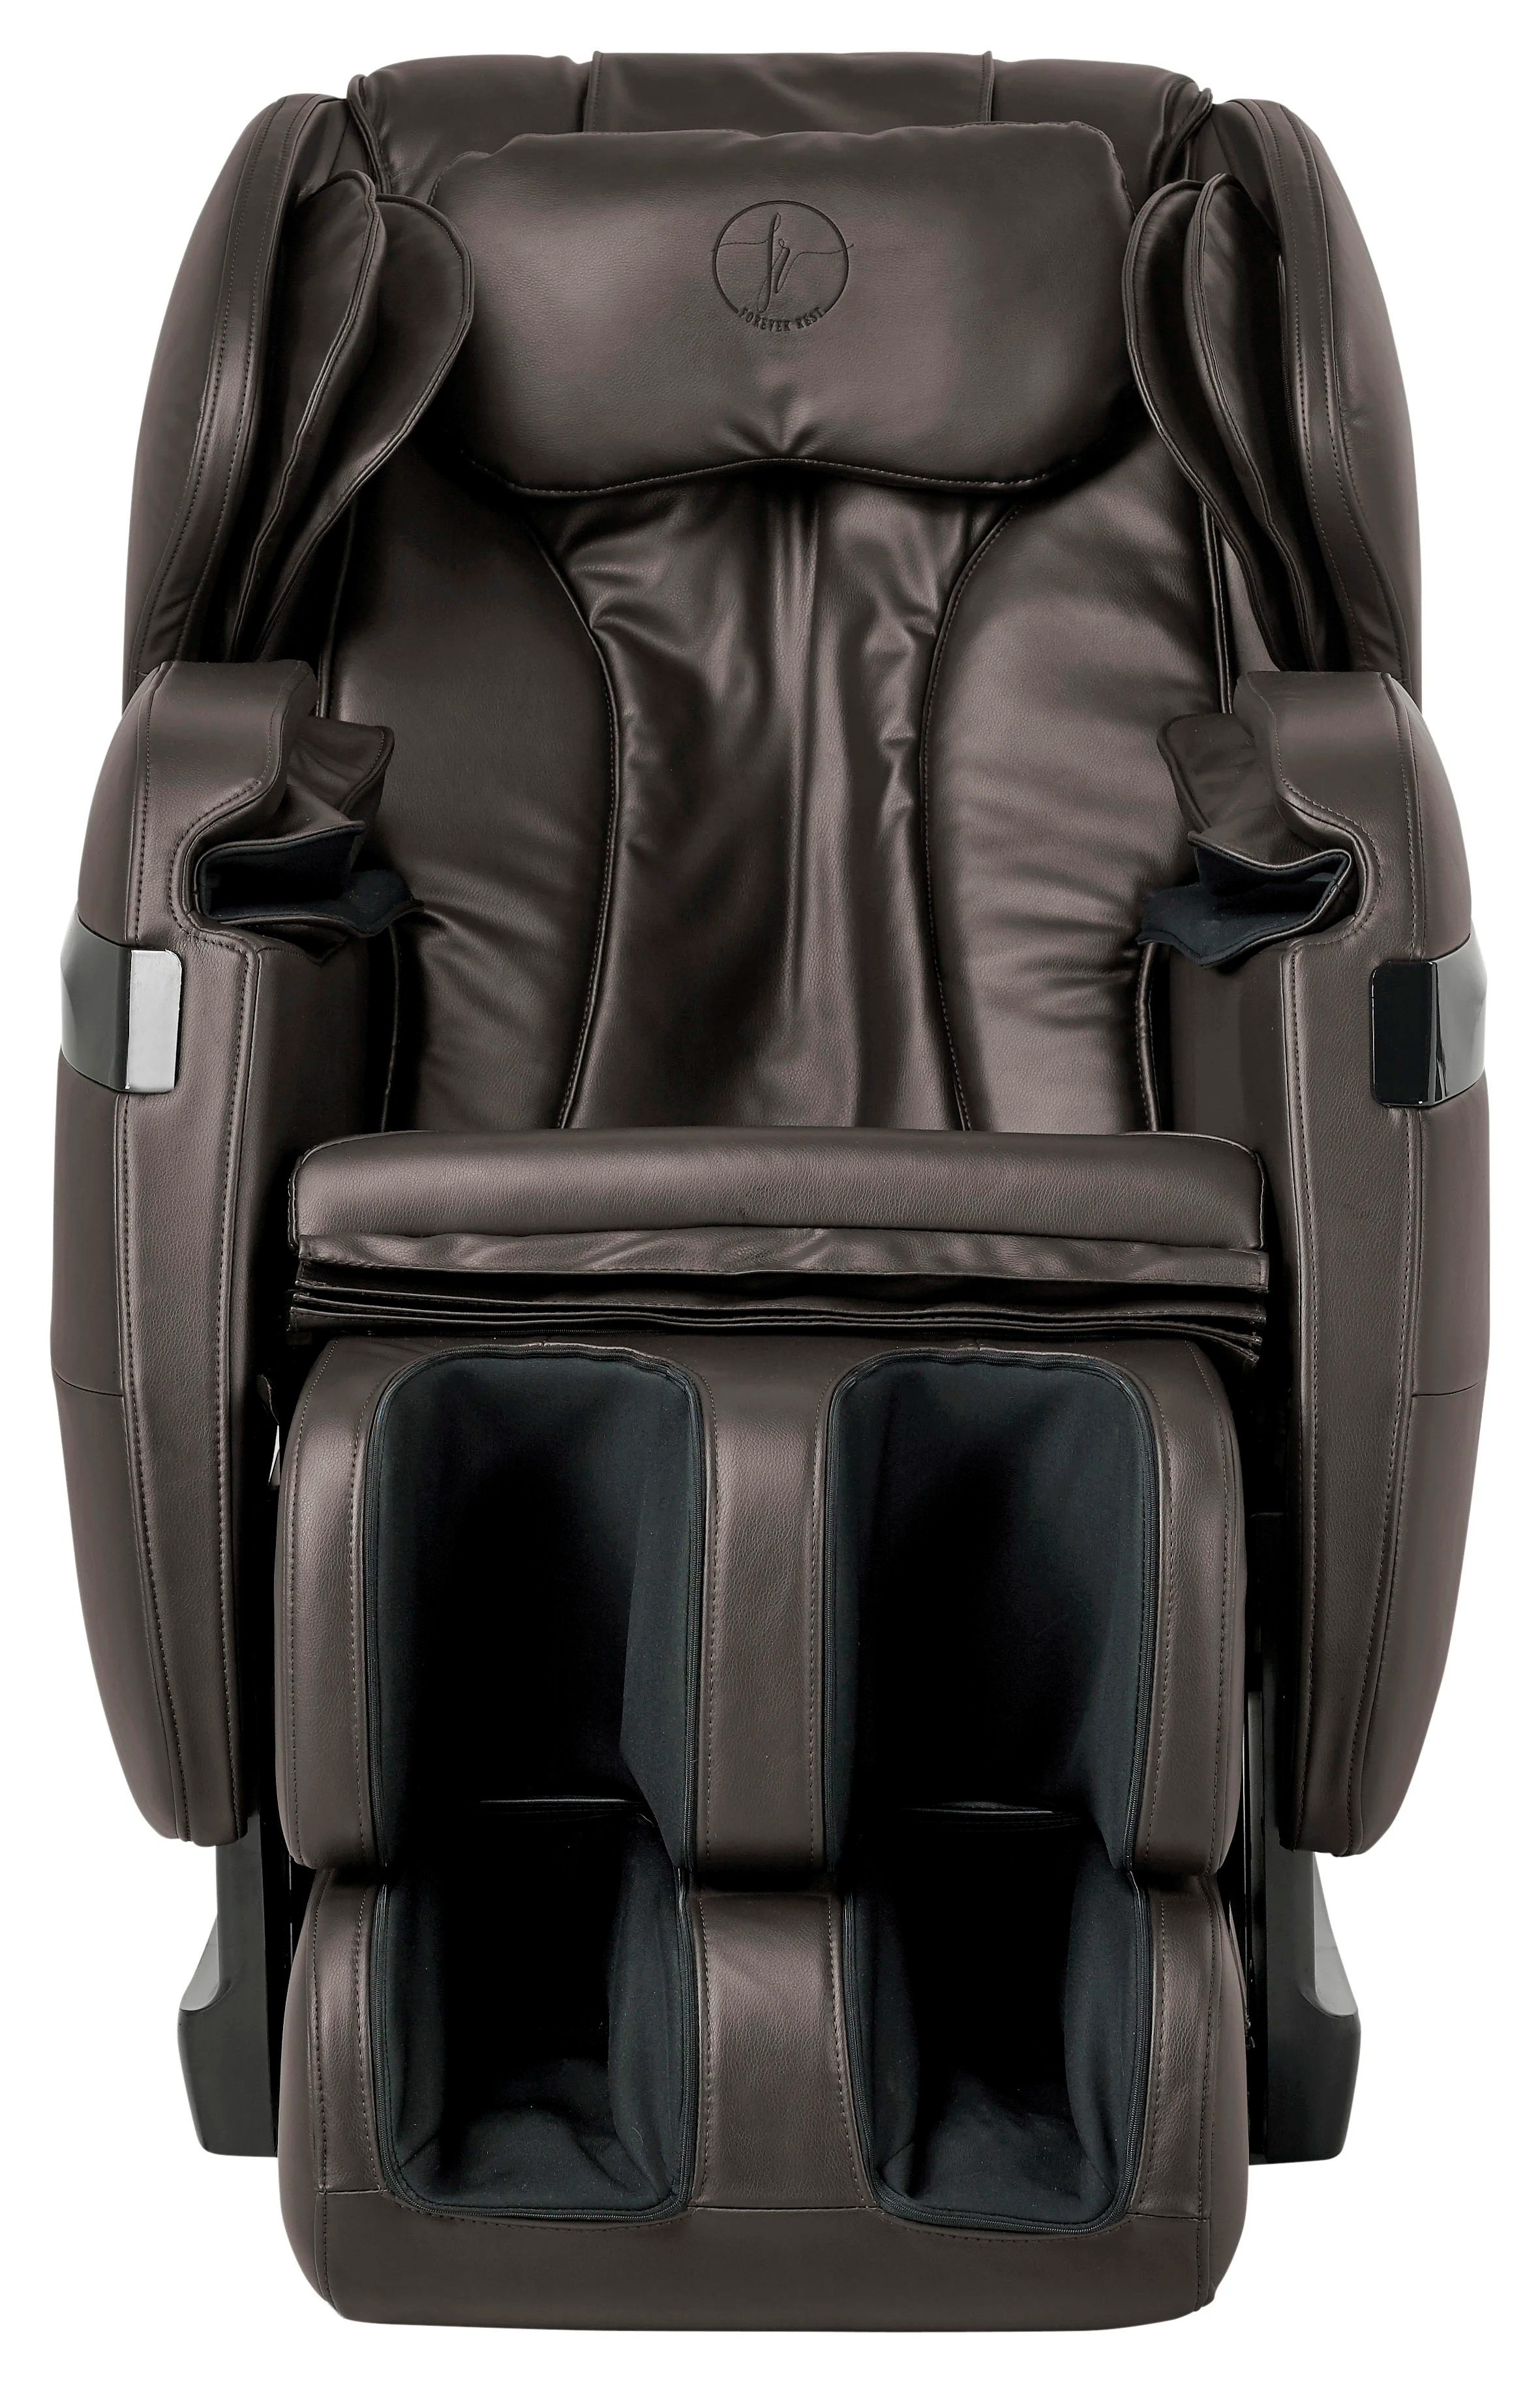 best zero gravity massage chair white tufted high back red barrel studio new 2018 valued wayfair